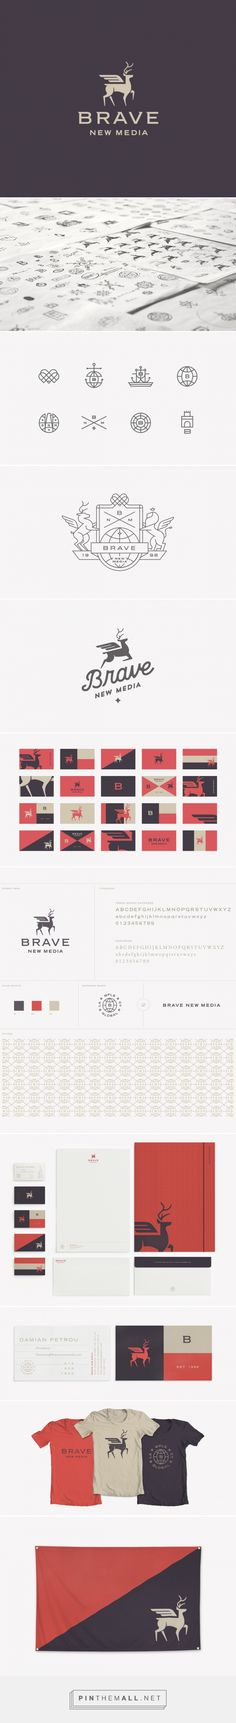 Brave New Media | Studio MPLS | Packaging and Branding Design